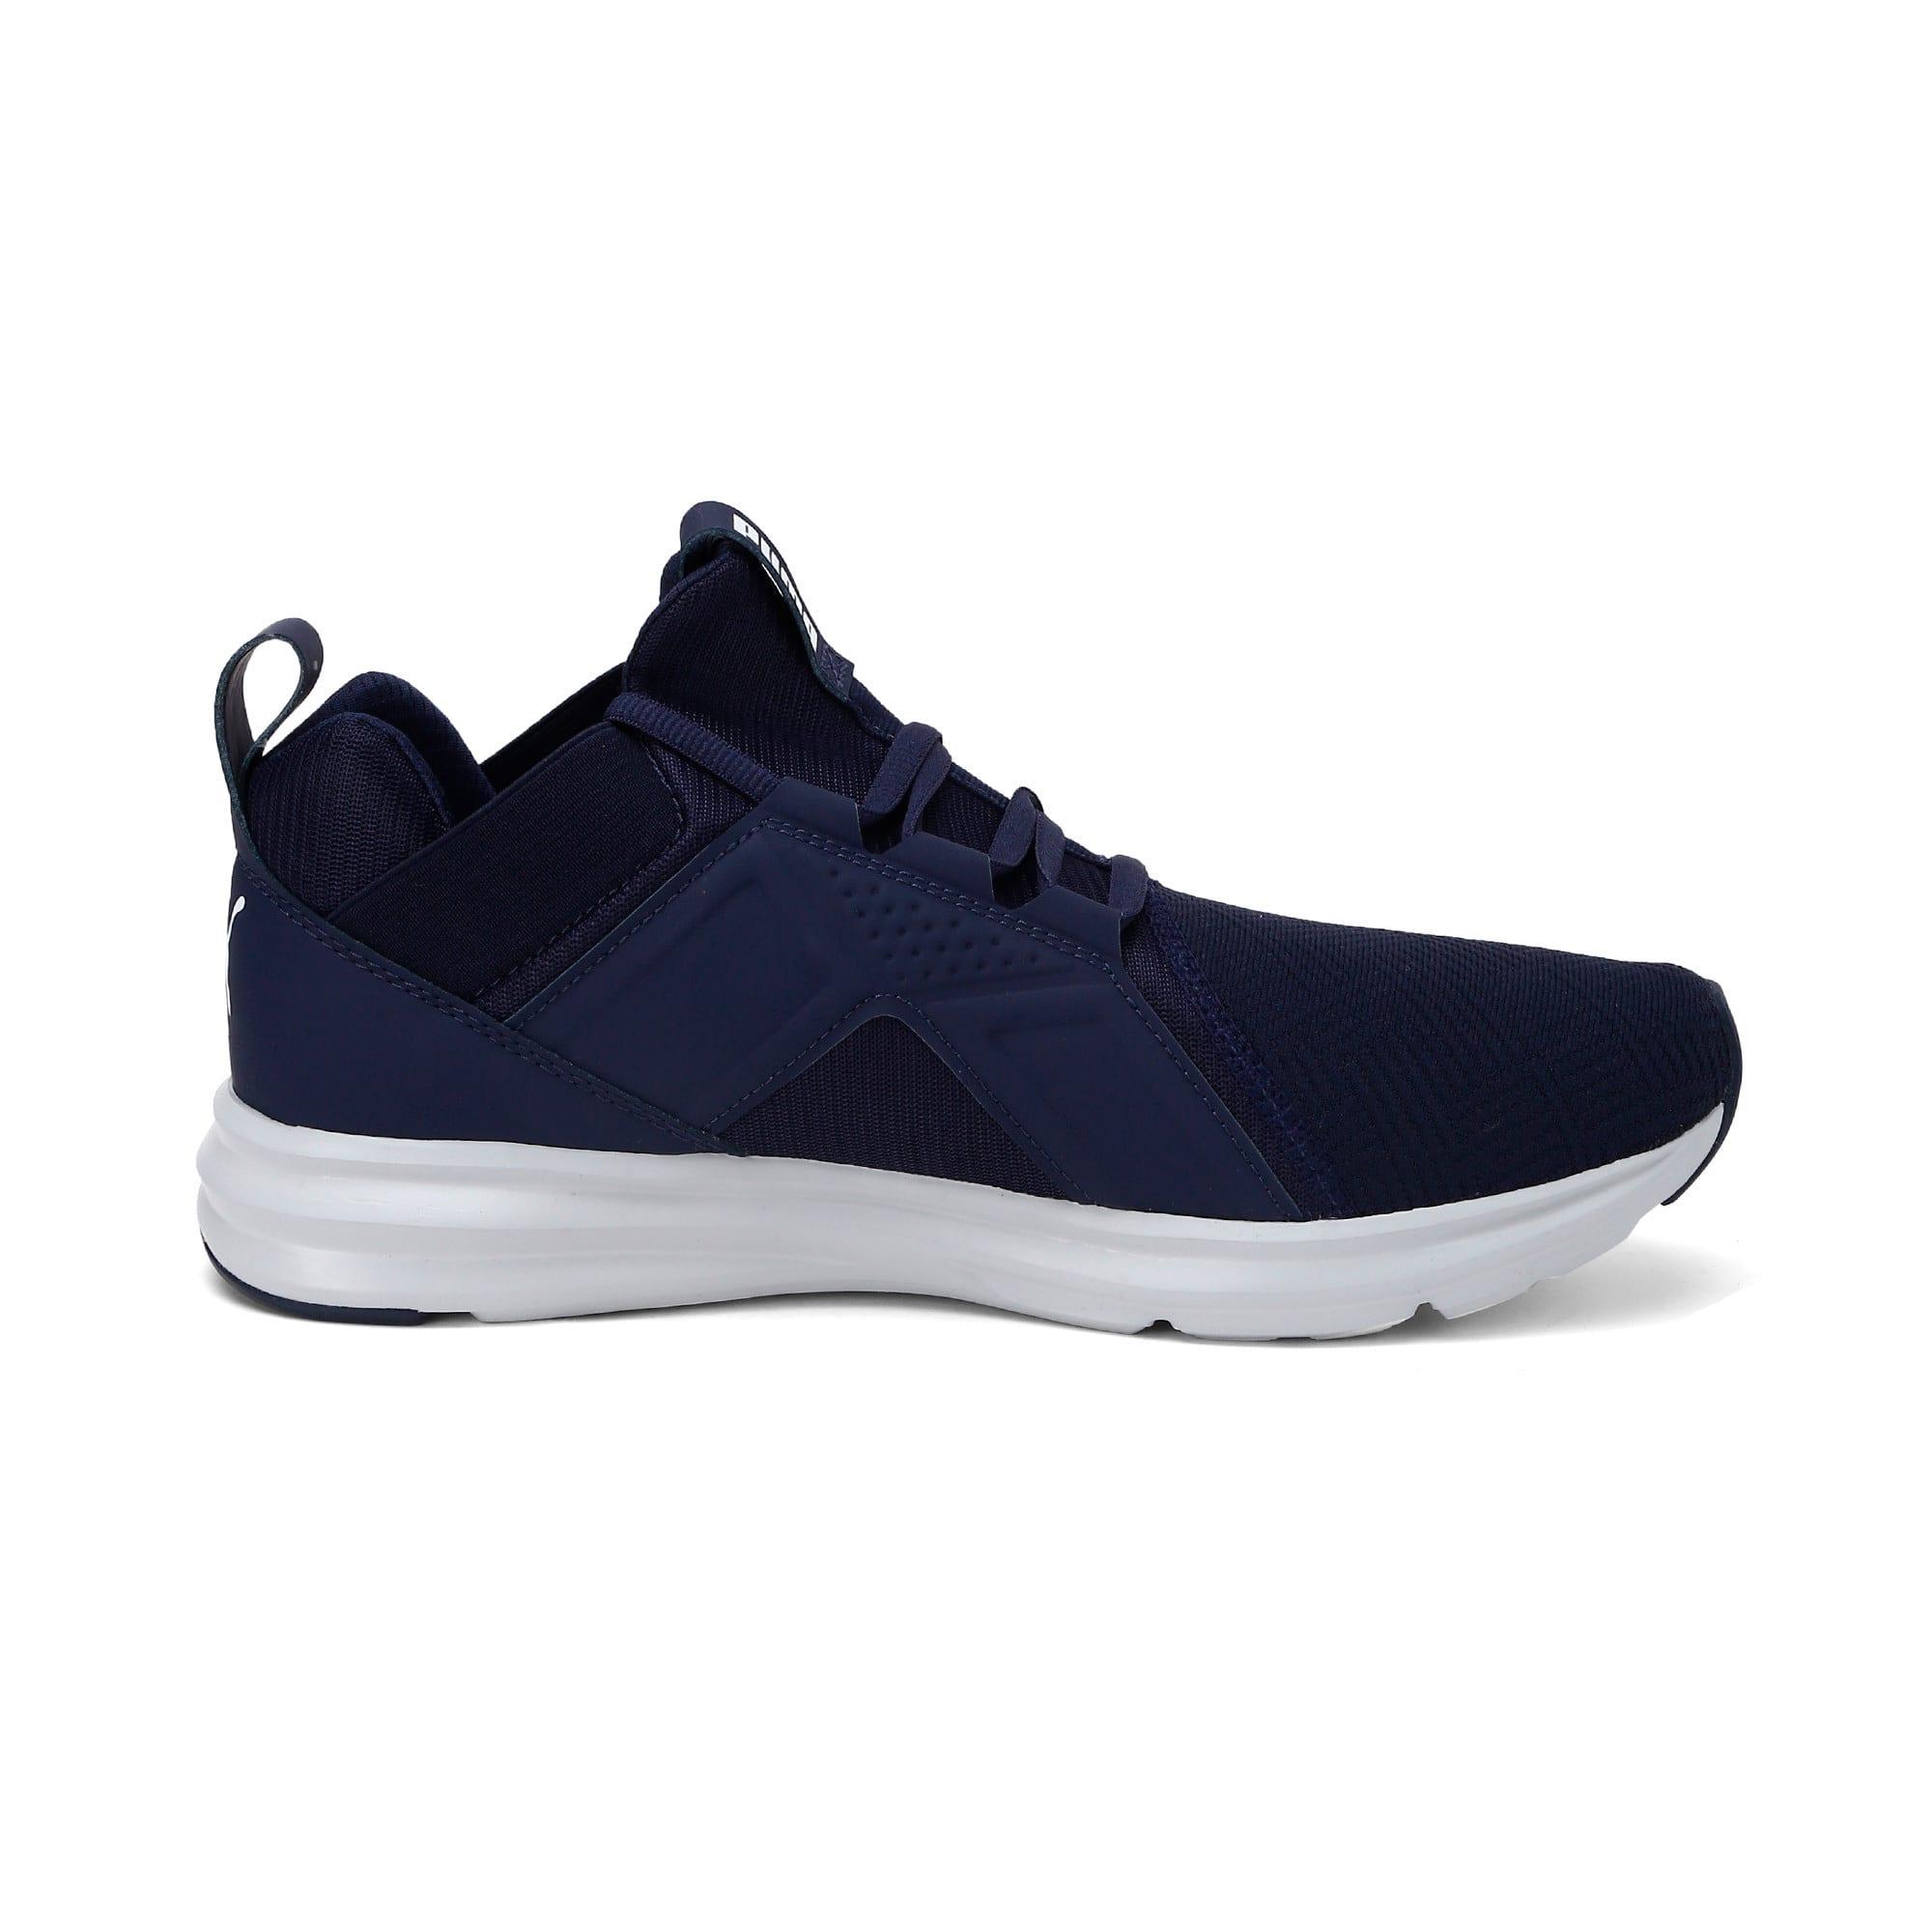 Thumbnail 5 of Enzo Geo Men's Running Shoes, Peacoat, medium-IND